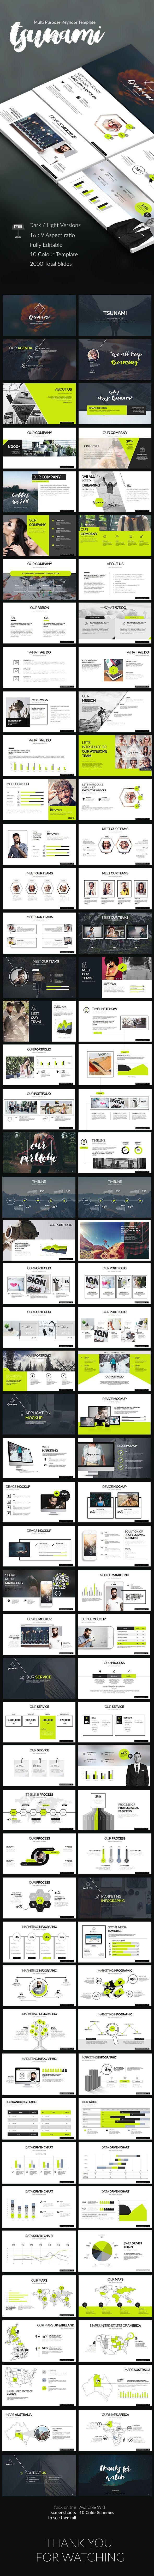 26 best images about slide decks on pinterest | powerpoint, Presentation templates